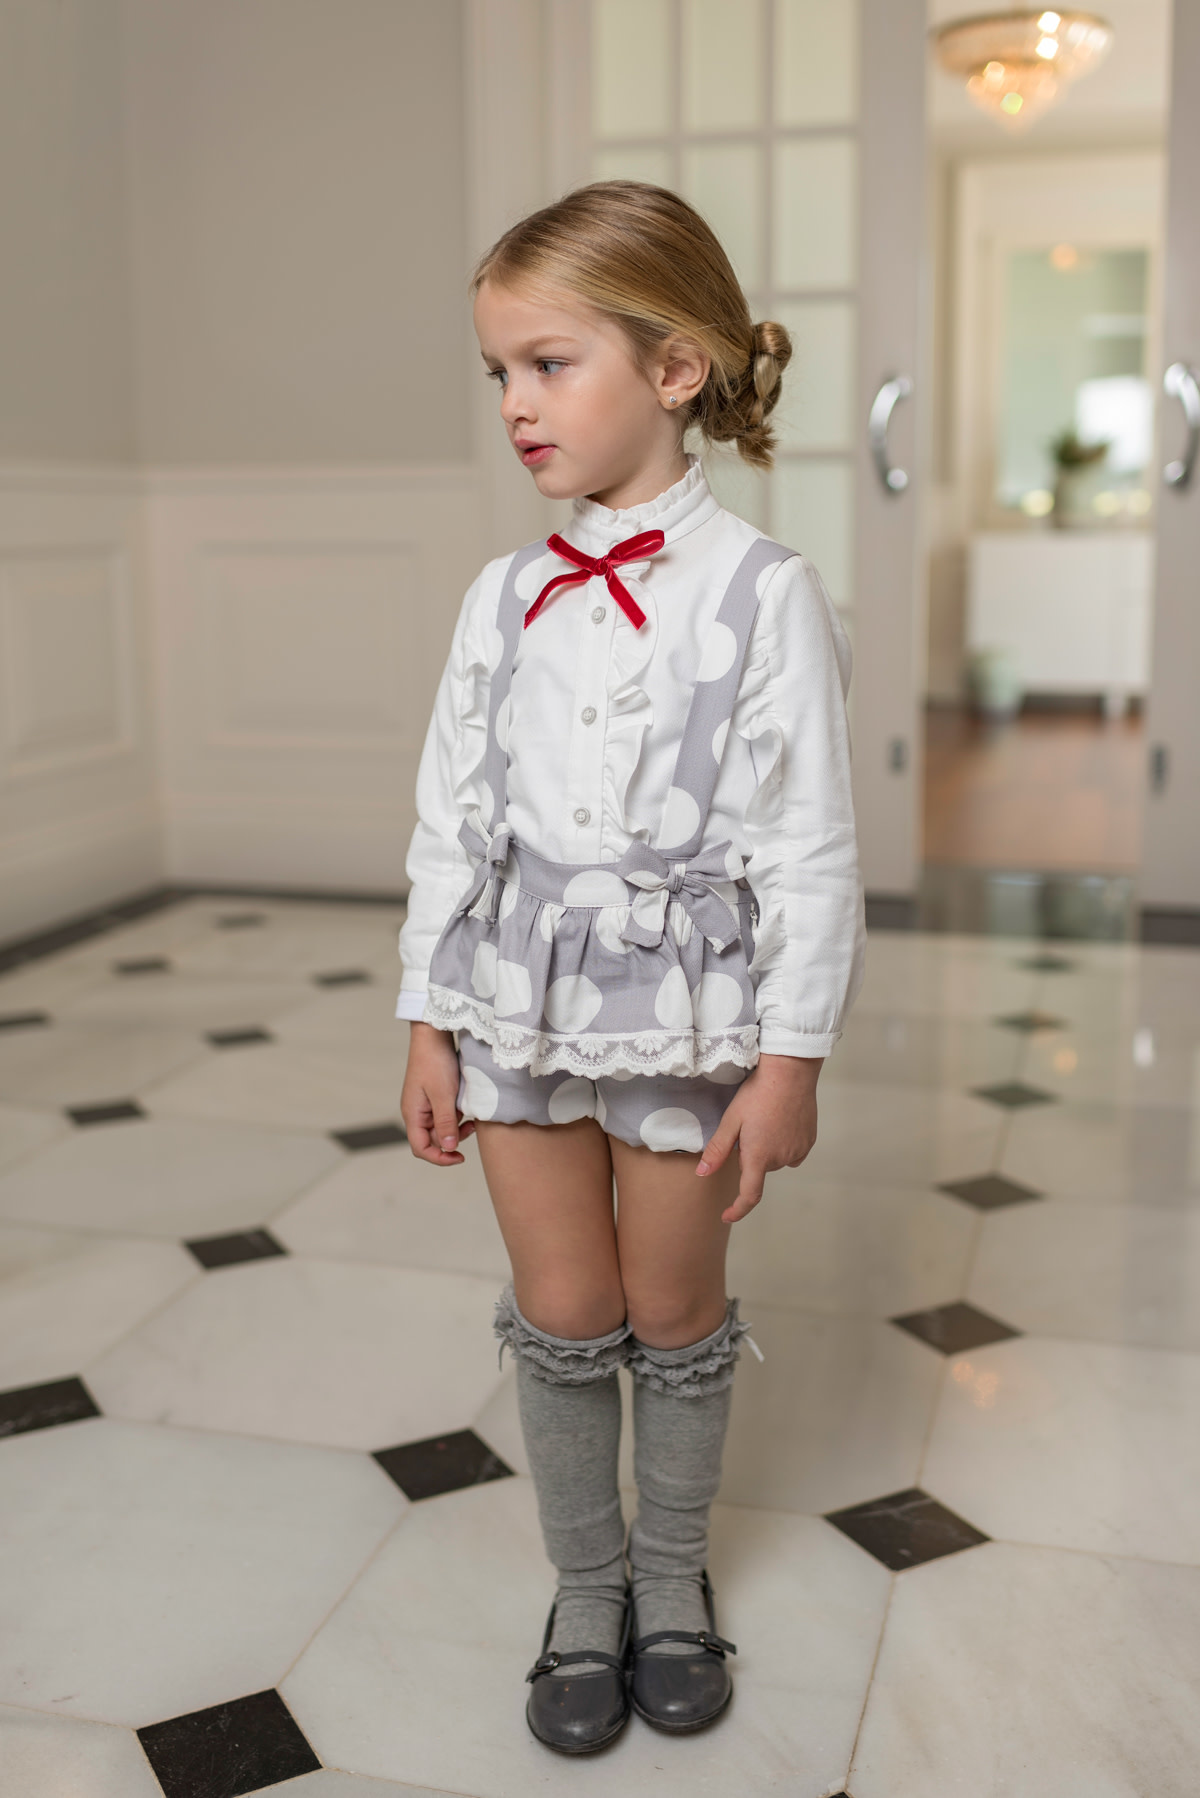 Dolce Petit Dolce Petit AW19 Girls Grey Shorts 2 Piece Set 2240-2 Age 6 Years